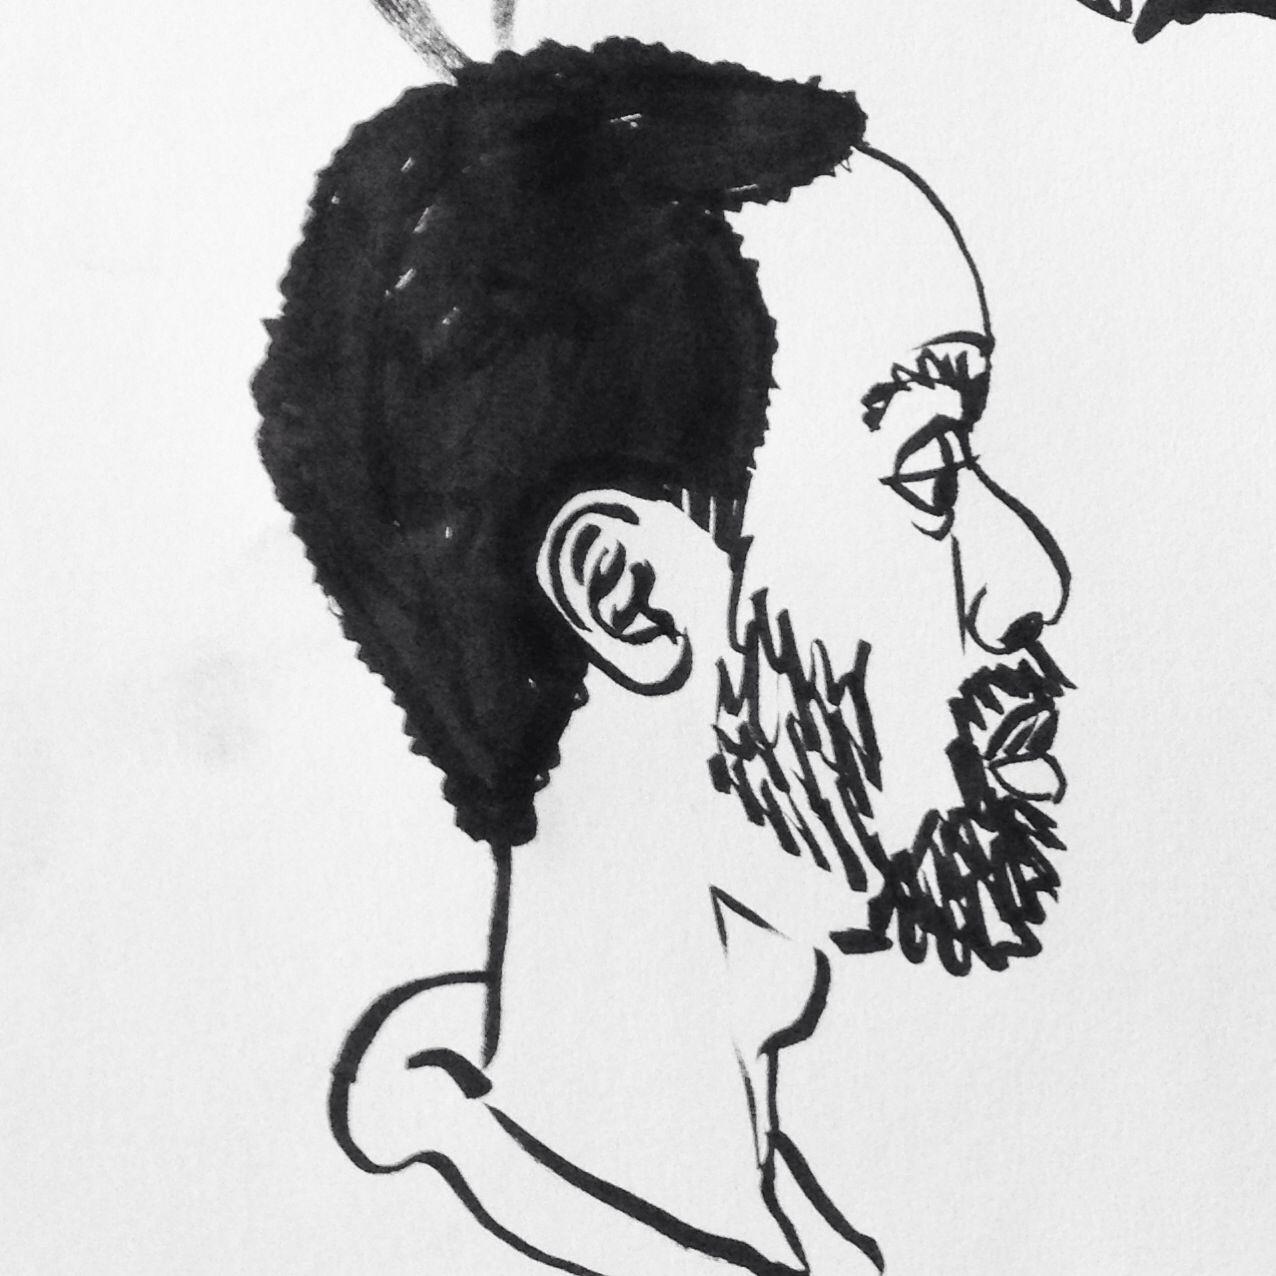 Ink portrait of a man